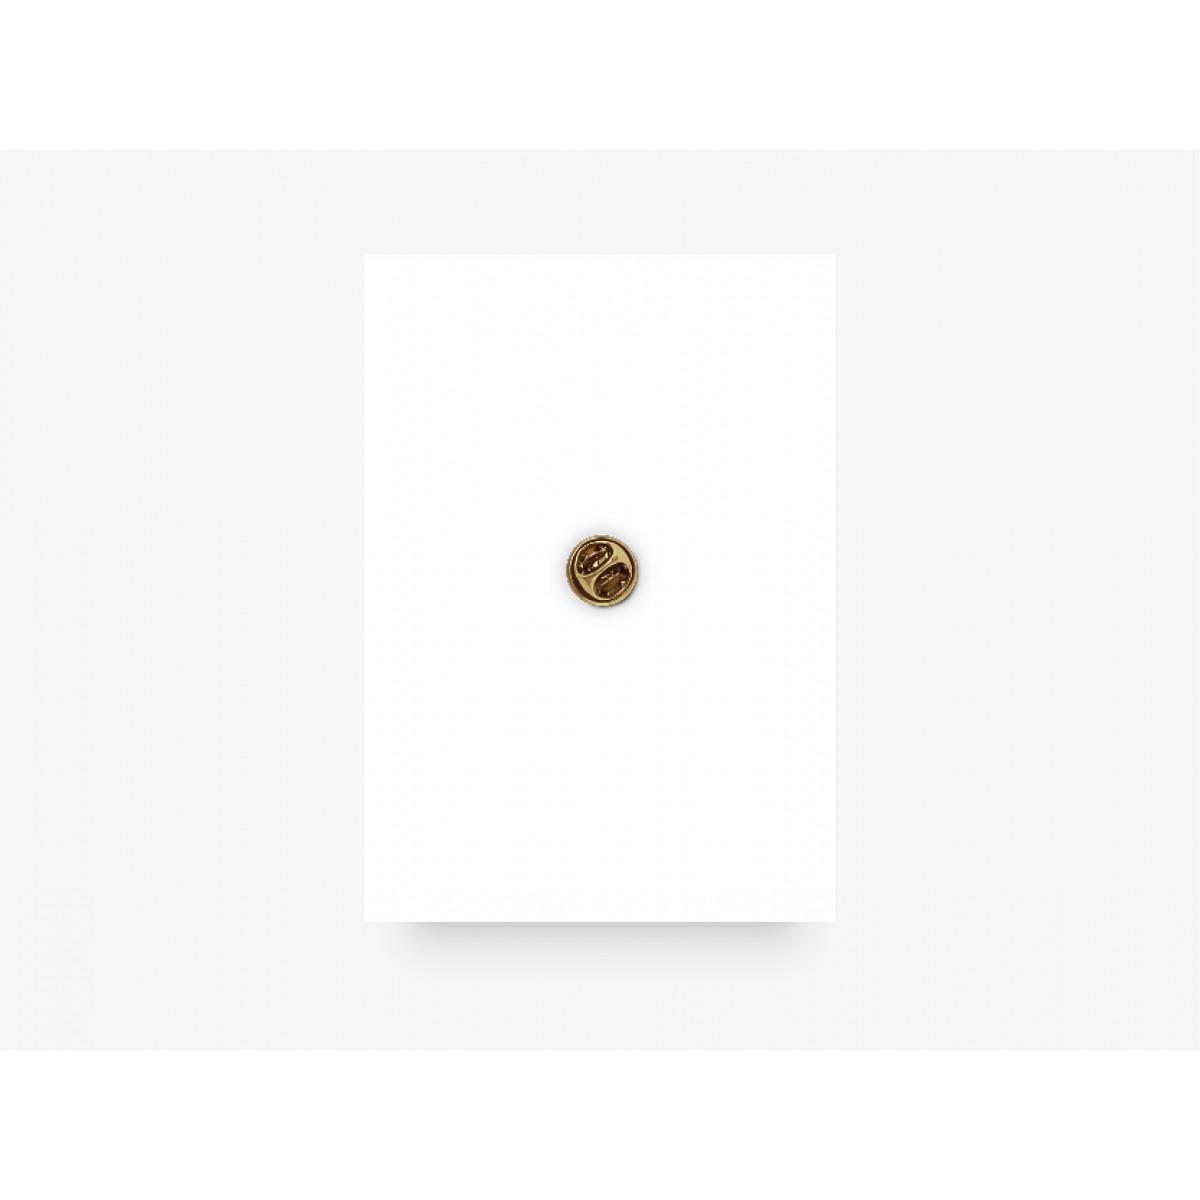 typealive / Pin / Wild Thing